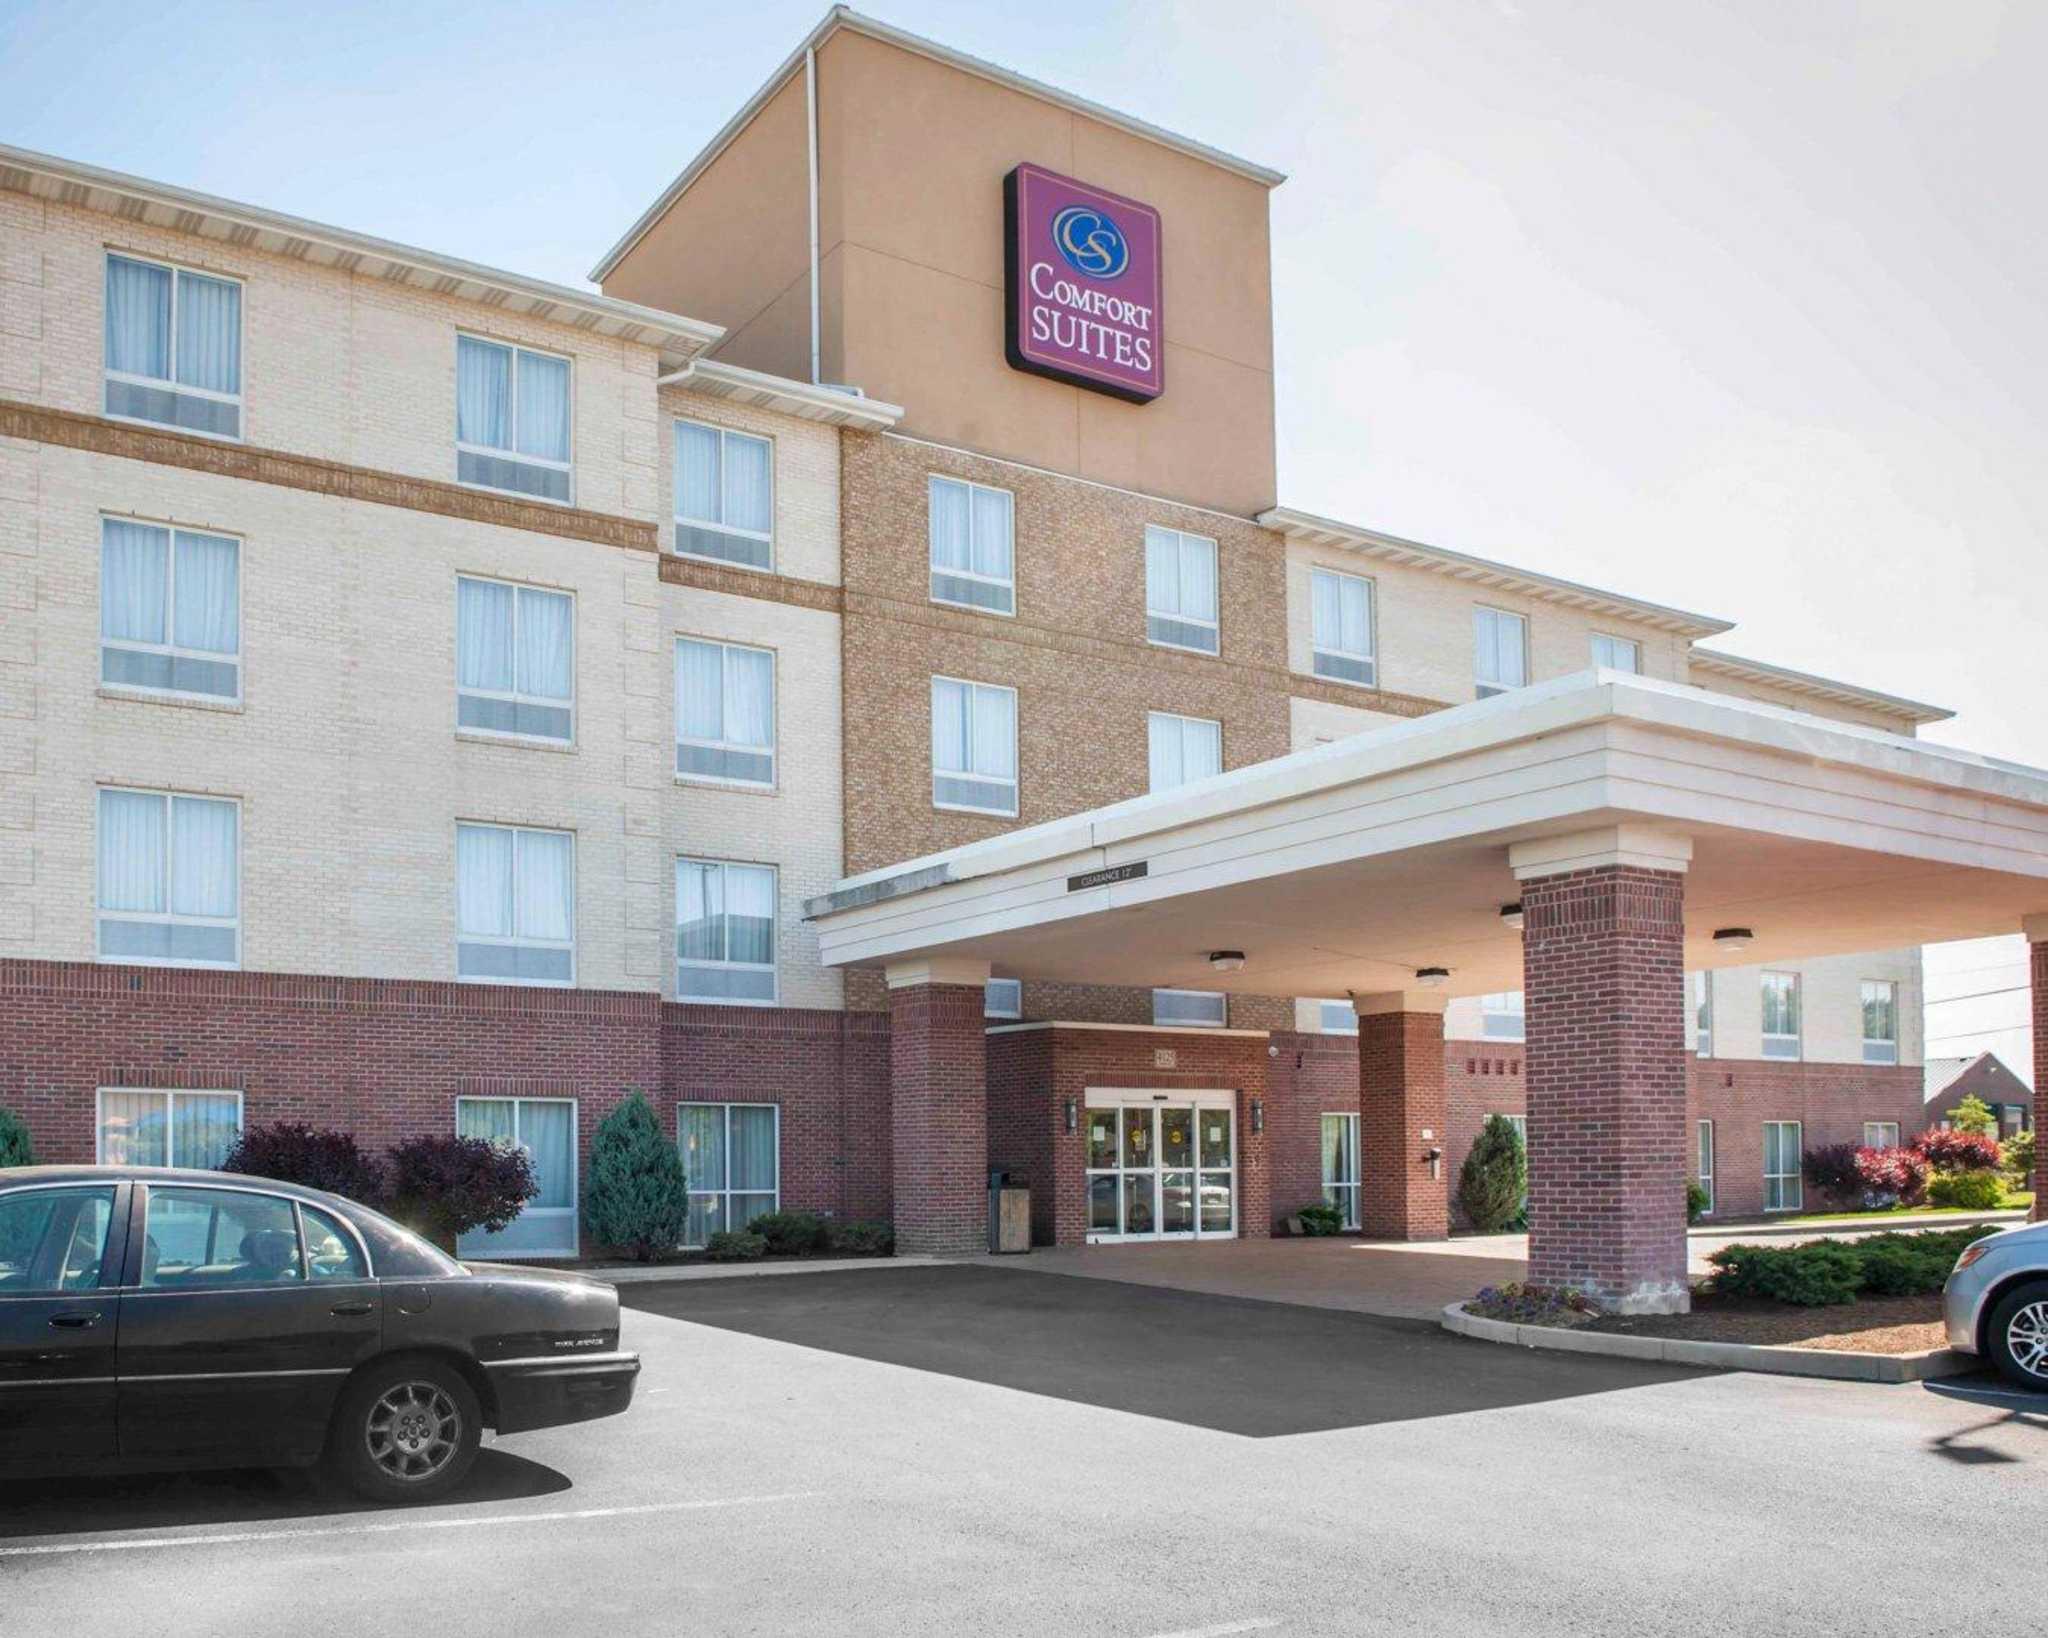 Comfort Suites Southport 4125 Kildeer Drive